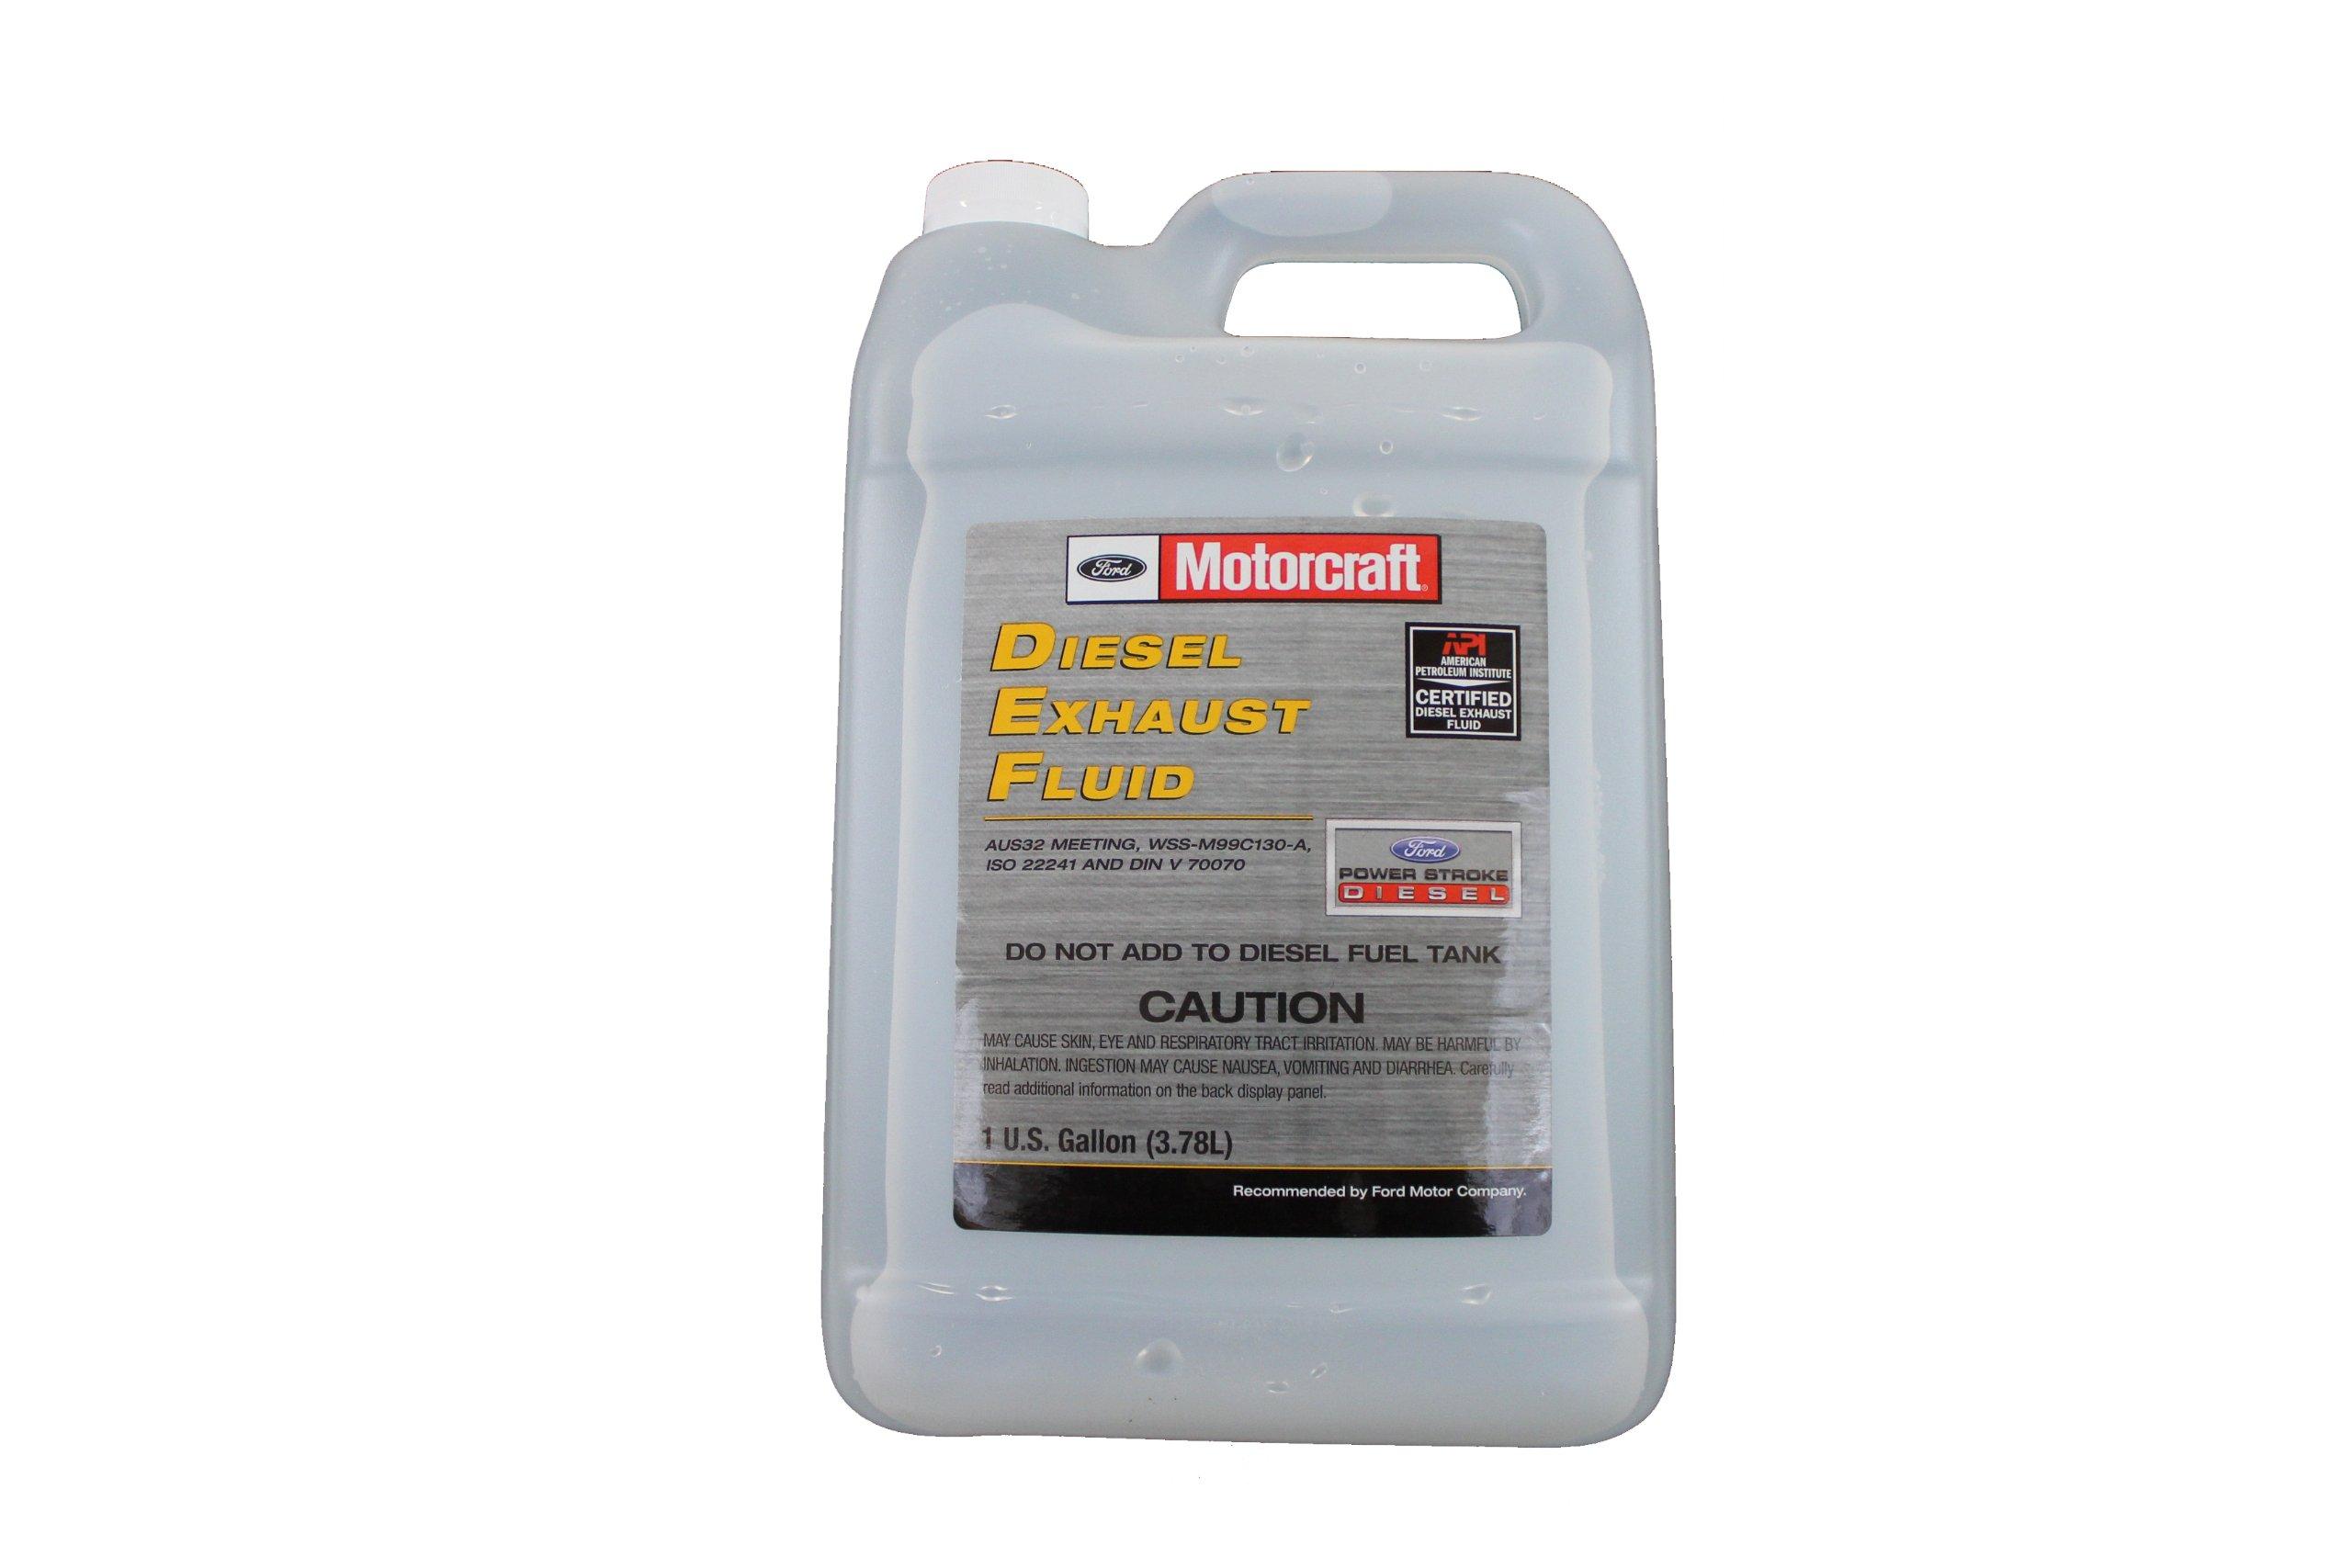 Ford Genuine Fluid PM-27-GAL Diesel Exhaust Fluid - 1 Gallon